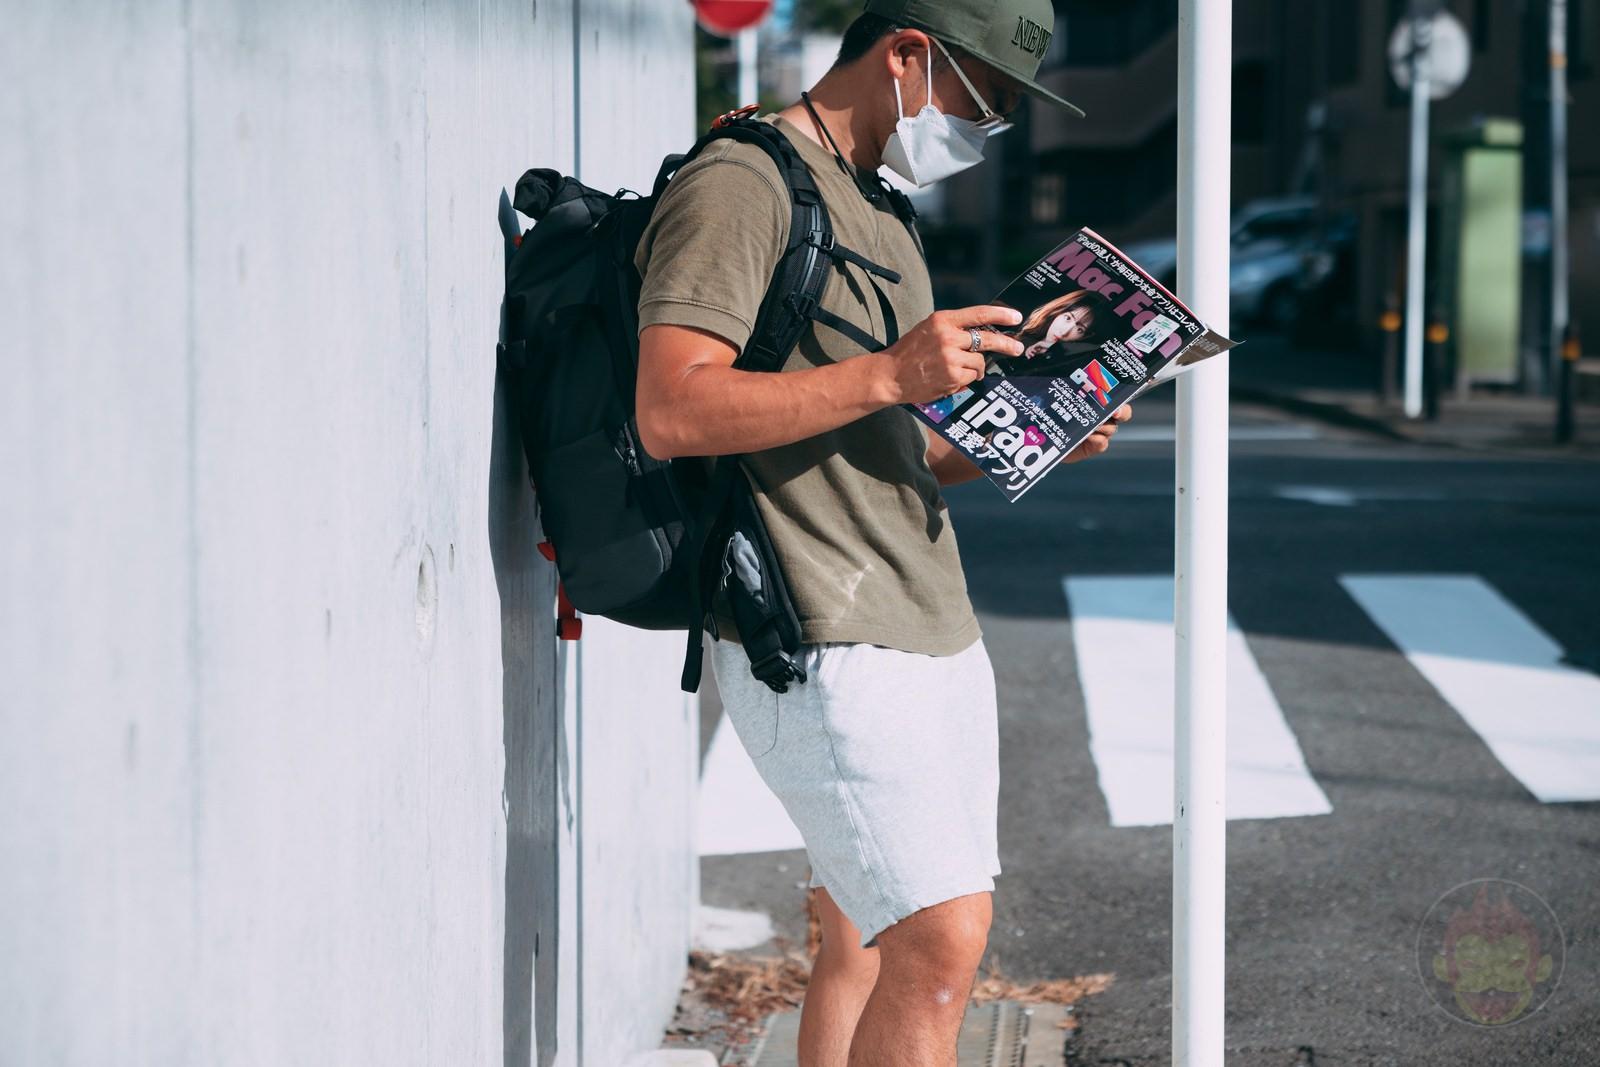 Lots of people are reading MacFan Sep2021 06